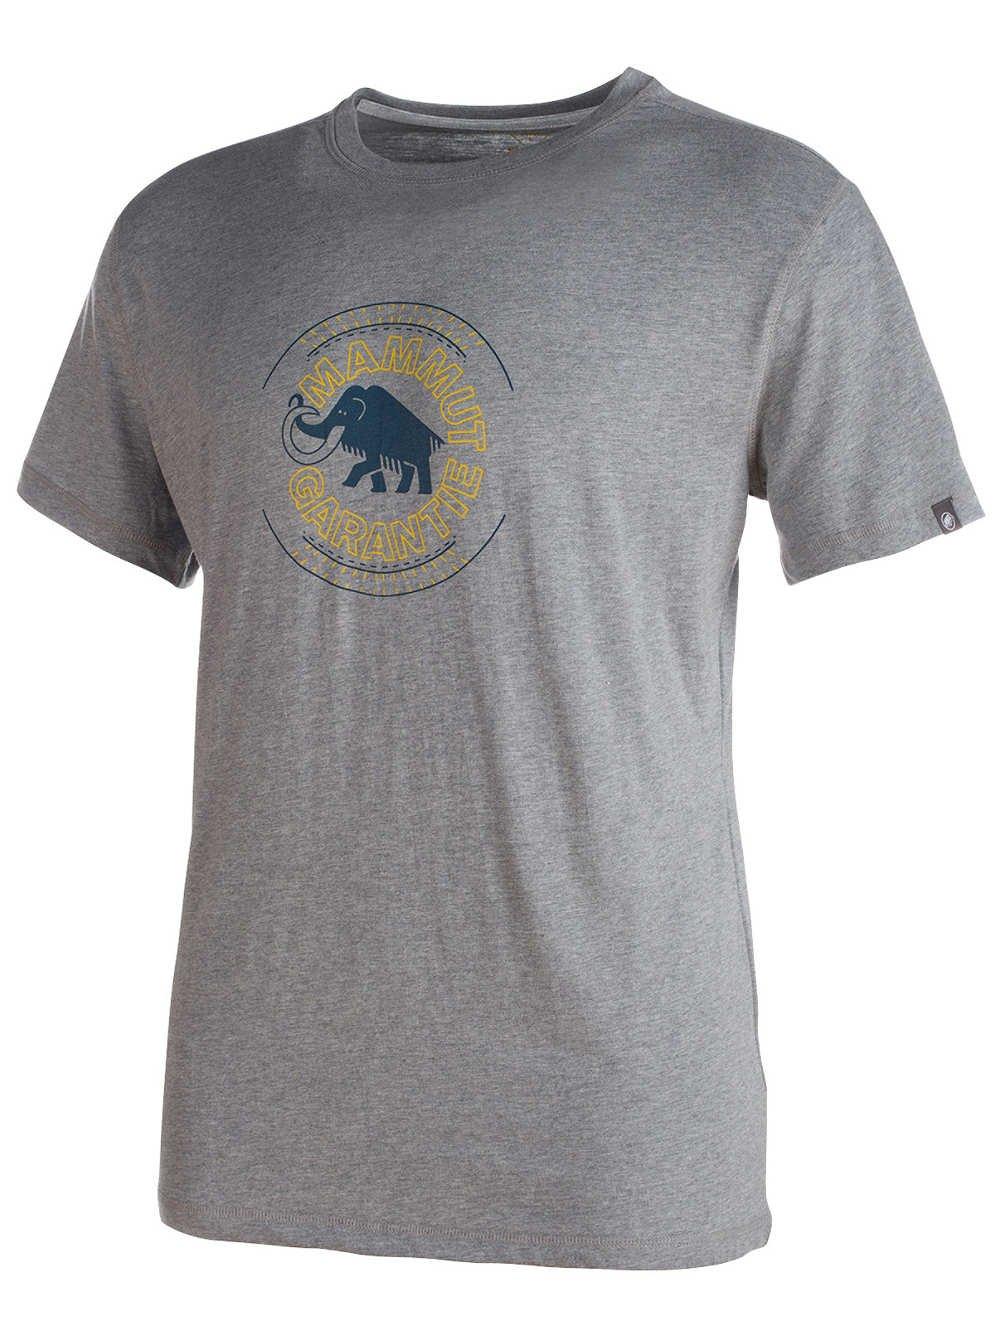 Mammut Garantie Shortsleeve Shirt black 2017 shortsleeve tshirt   Amazon.co.uk  Sports   Outdoors 84b3ea077fa7